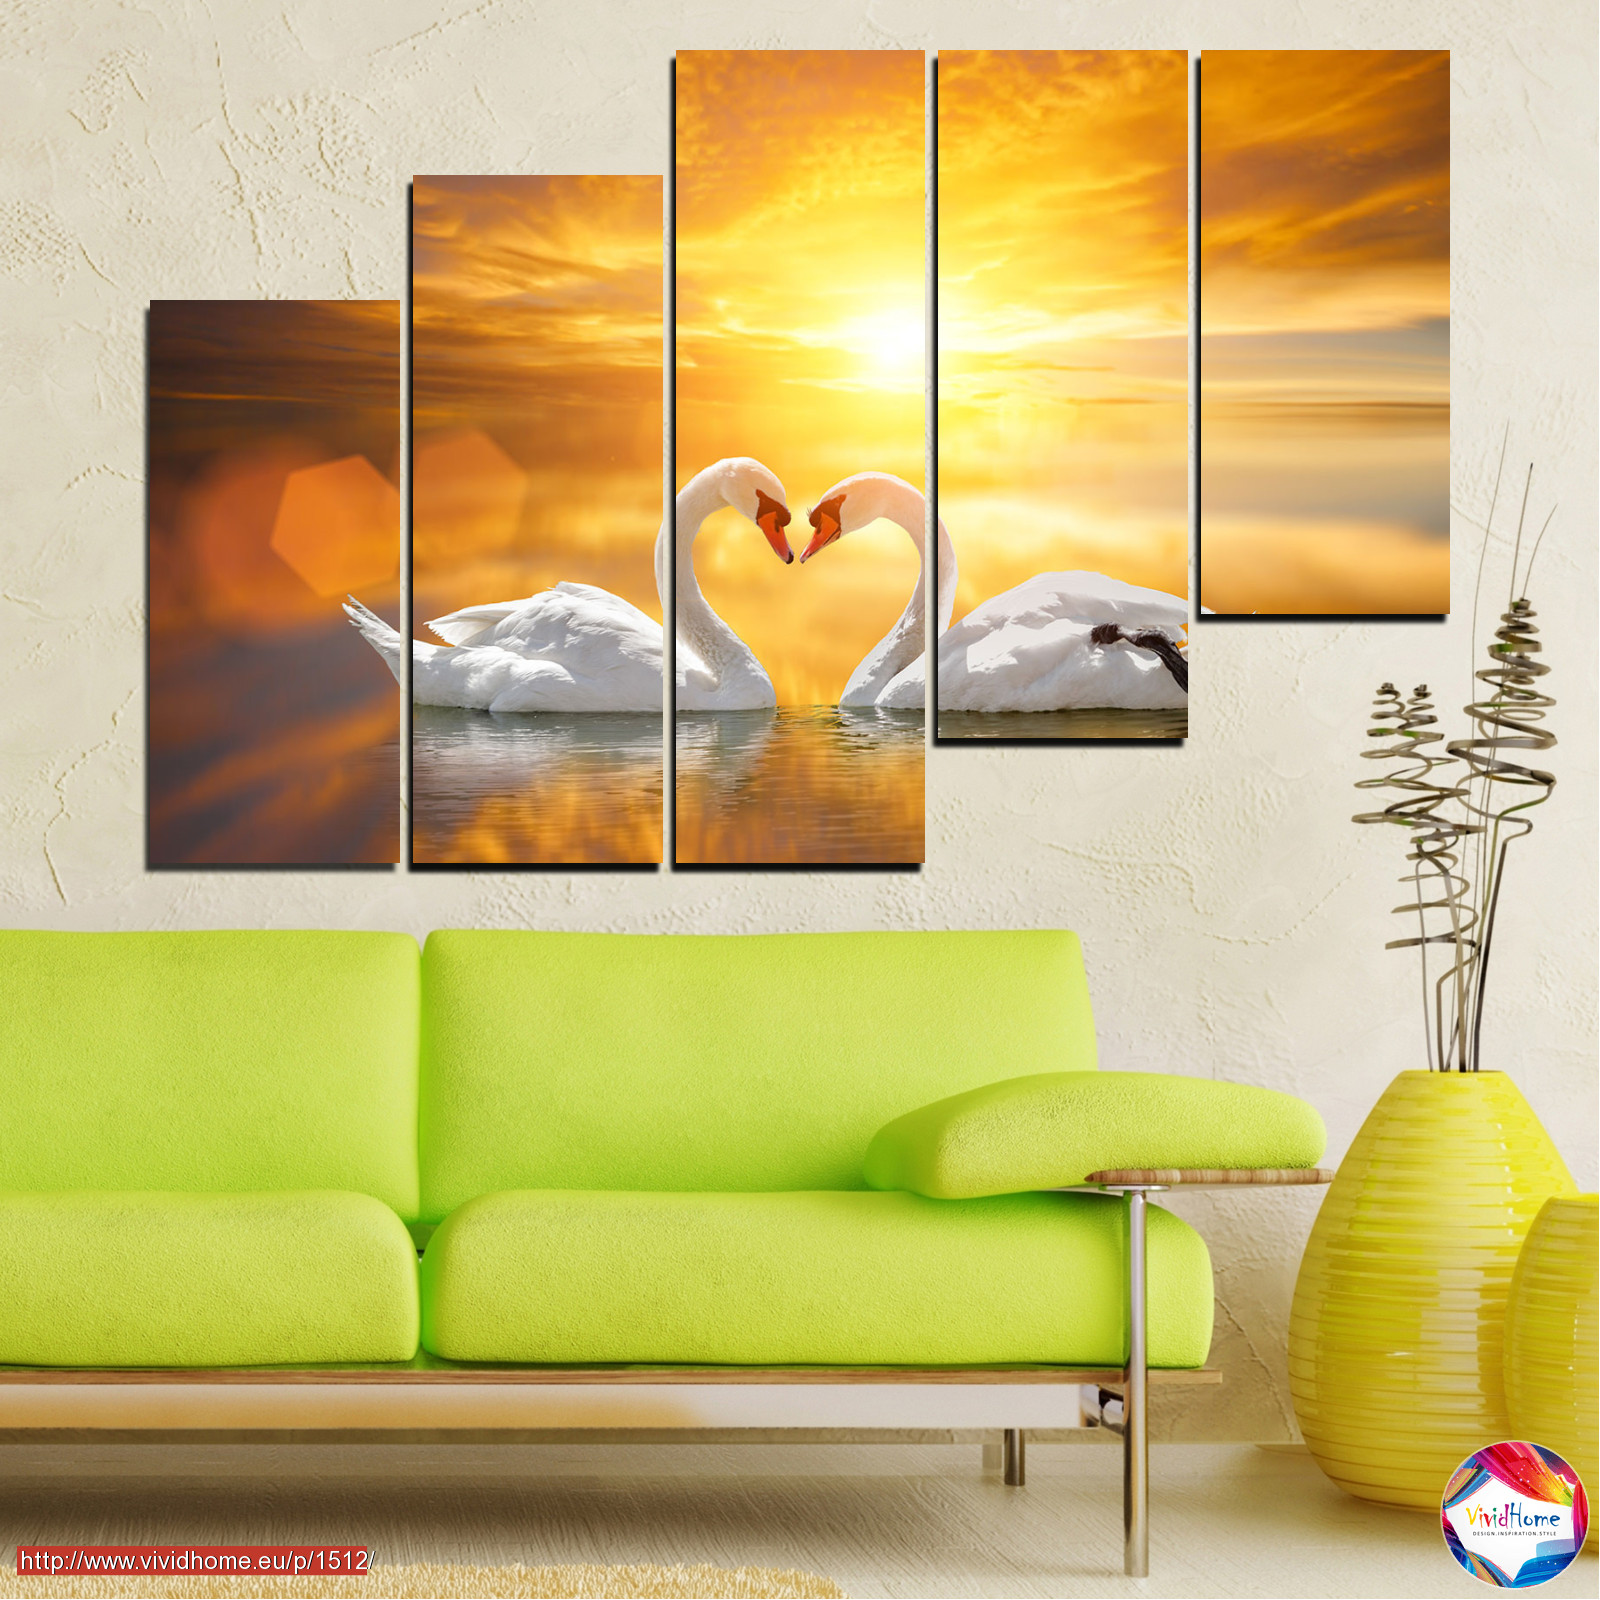 Sea, Water, Sunset, Ocean, Reflection, Swan, Light, Love №0773